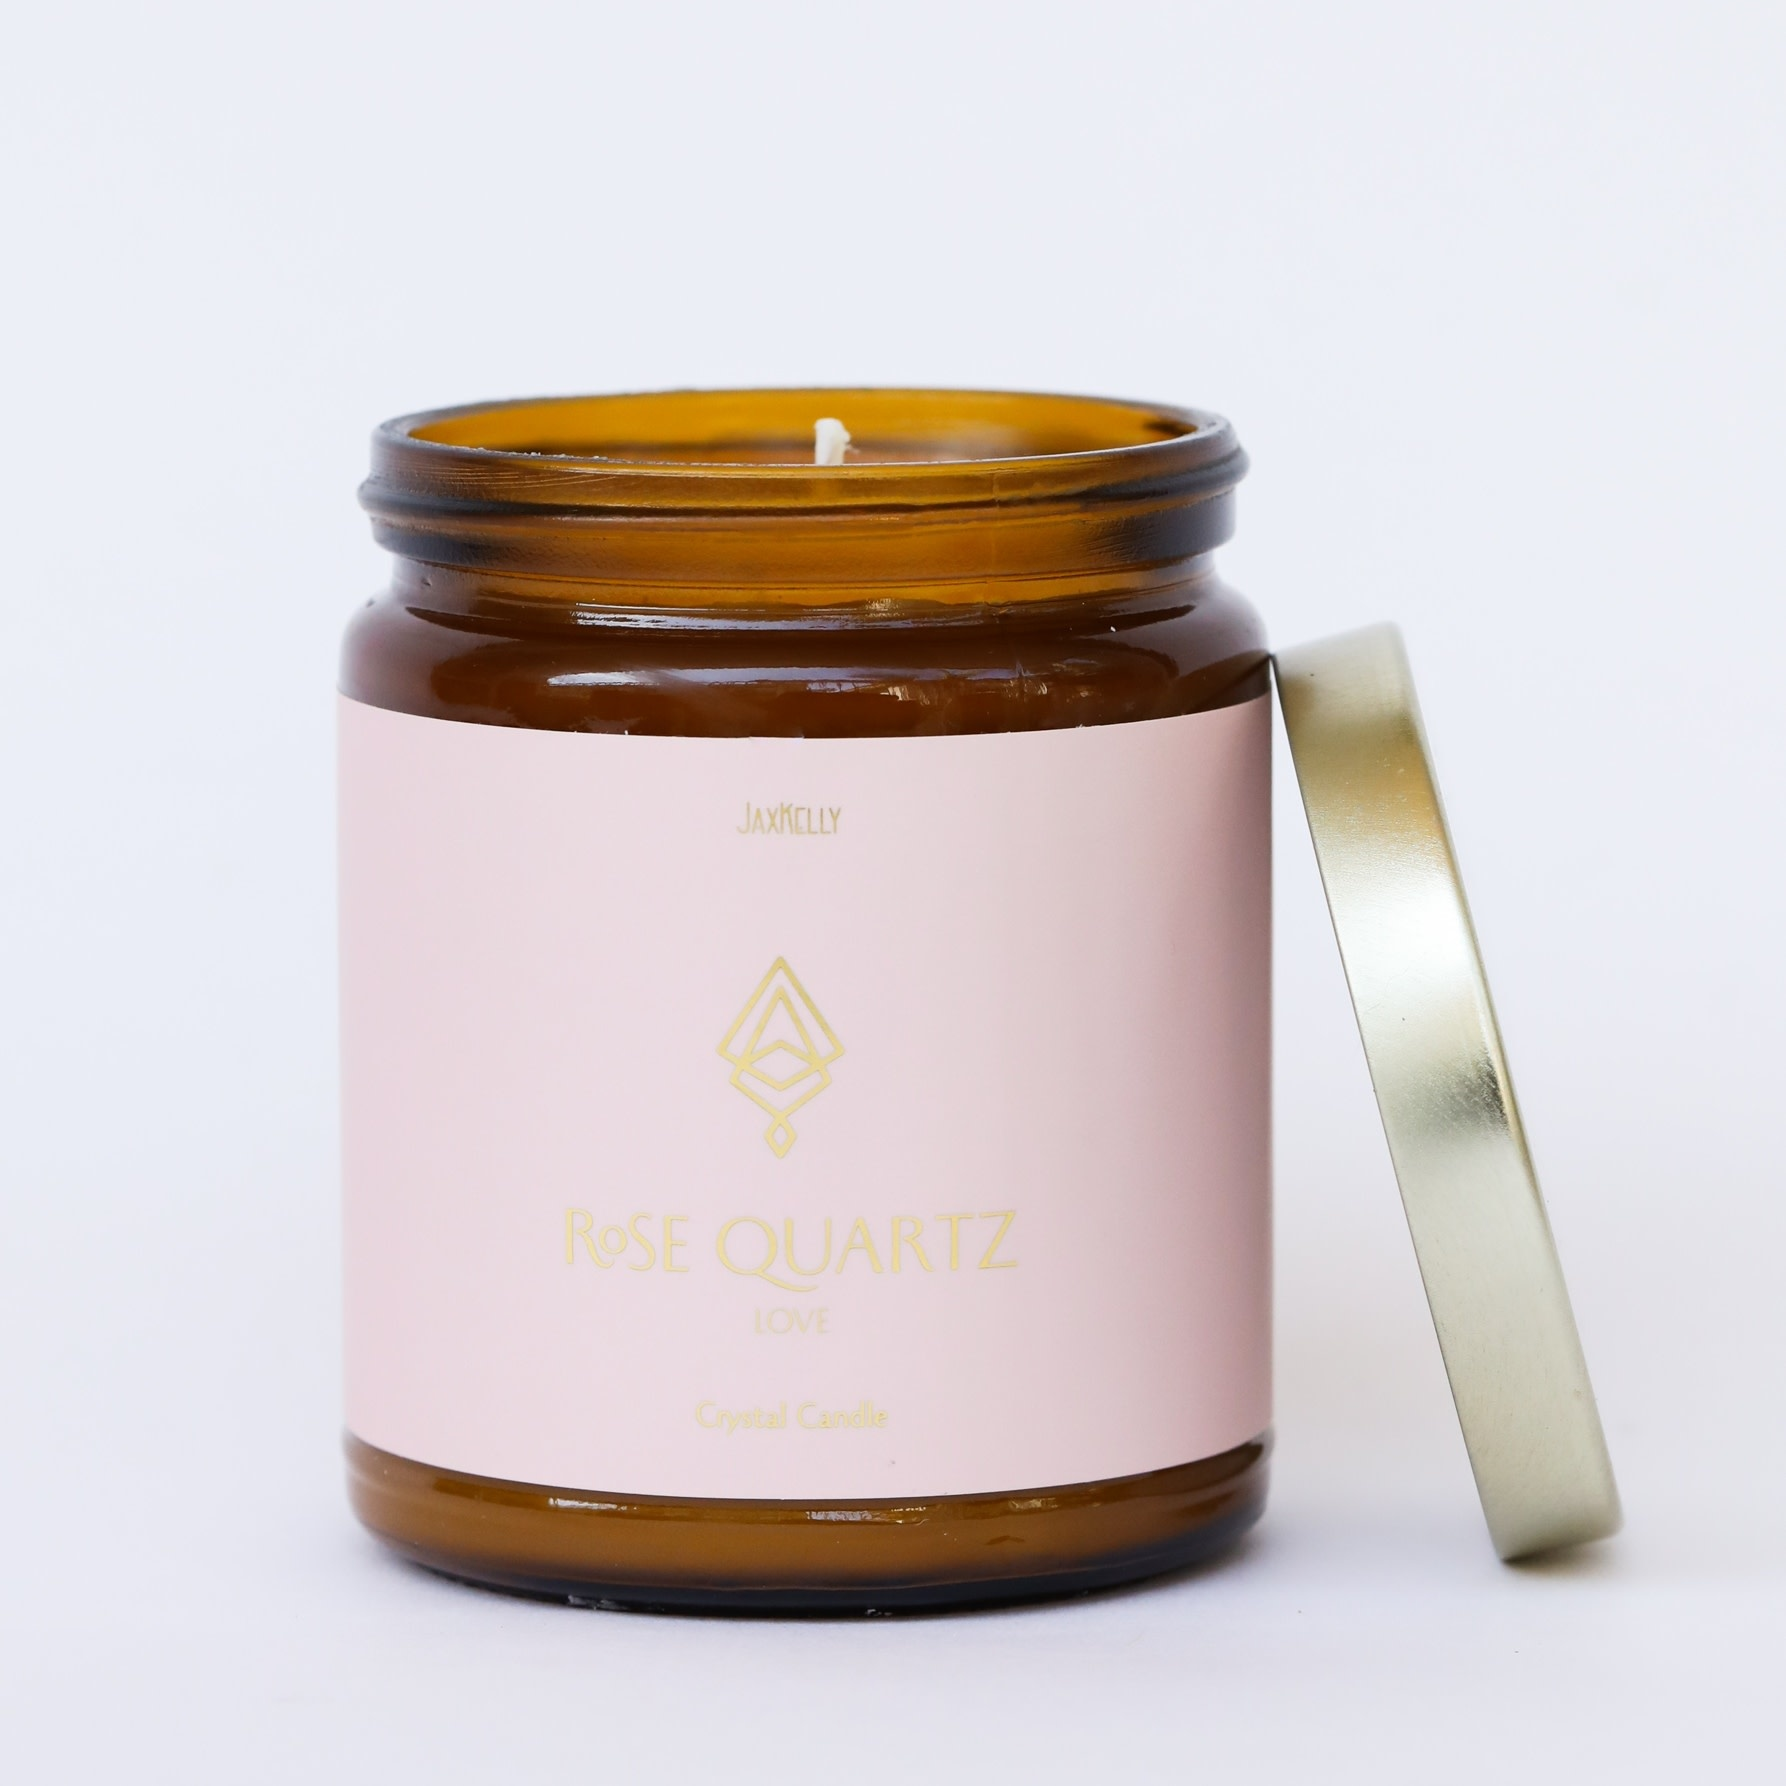 Rose Quartz Amber Crystal Candle